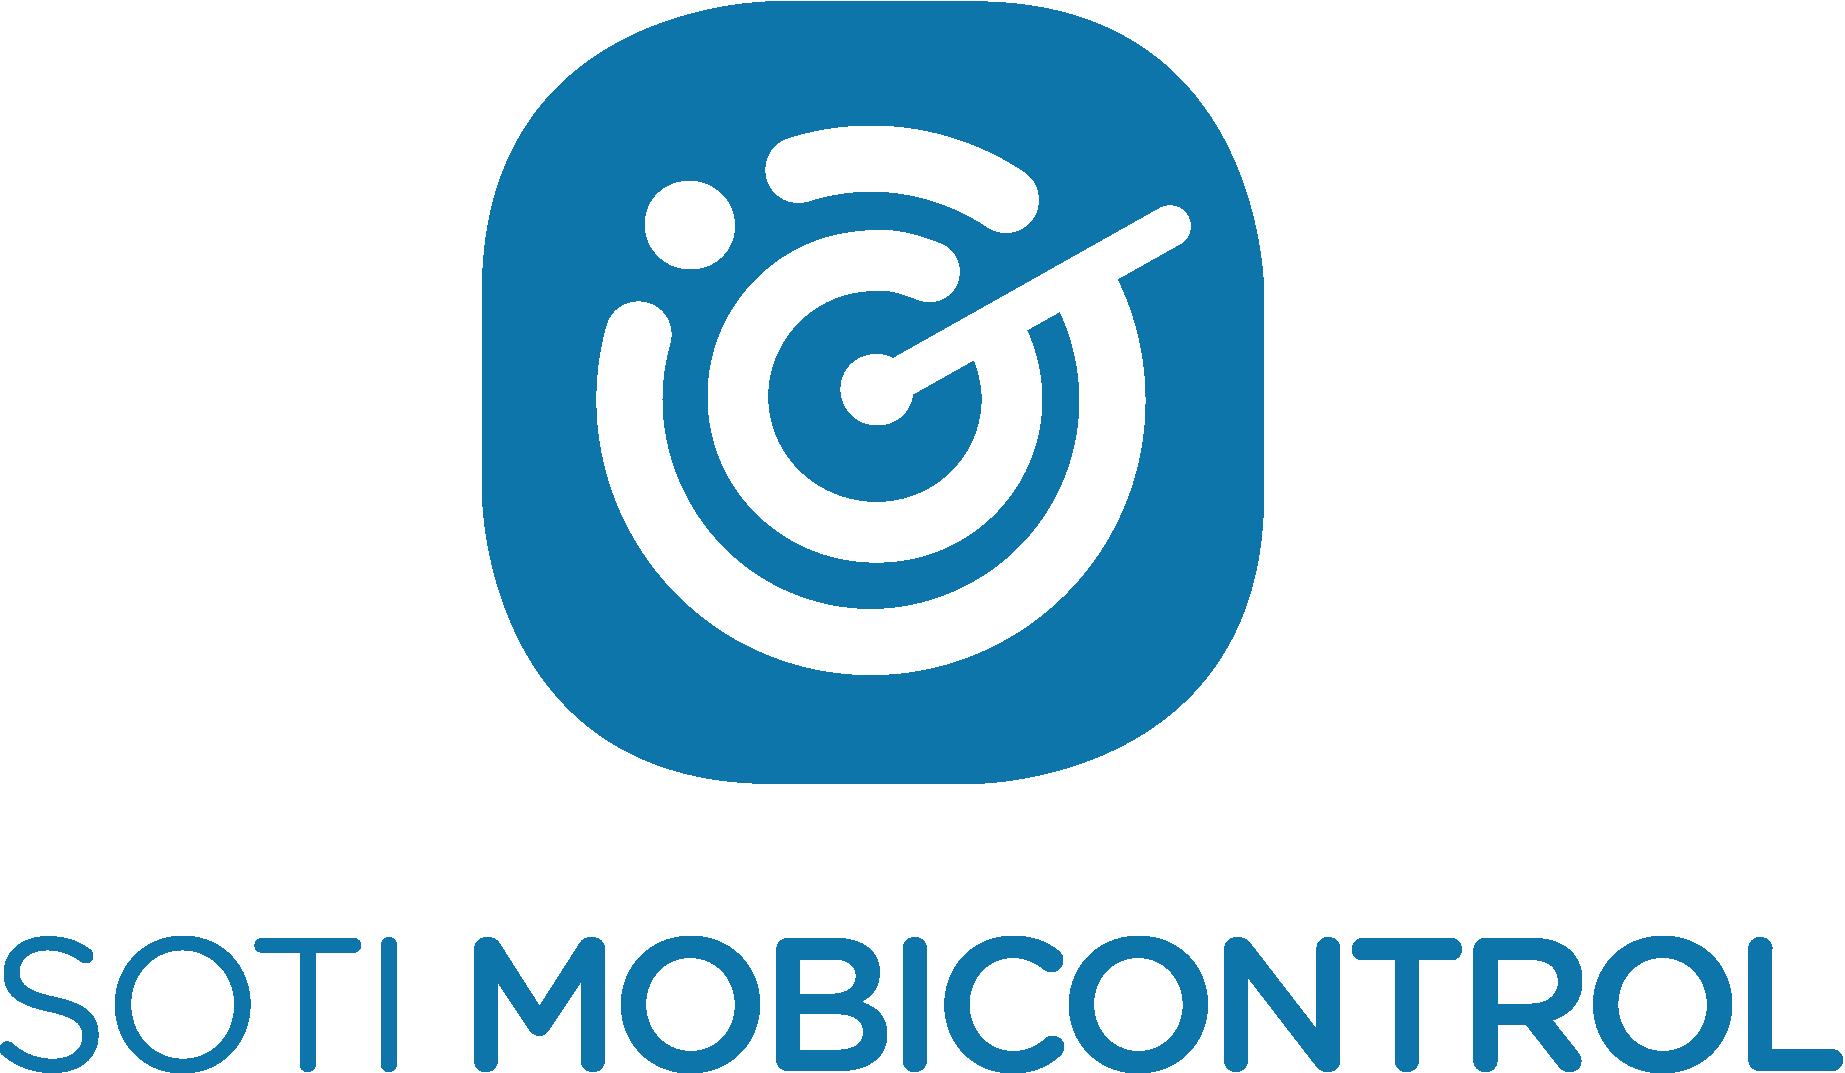 soti_mobicontrol_blue_verical